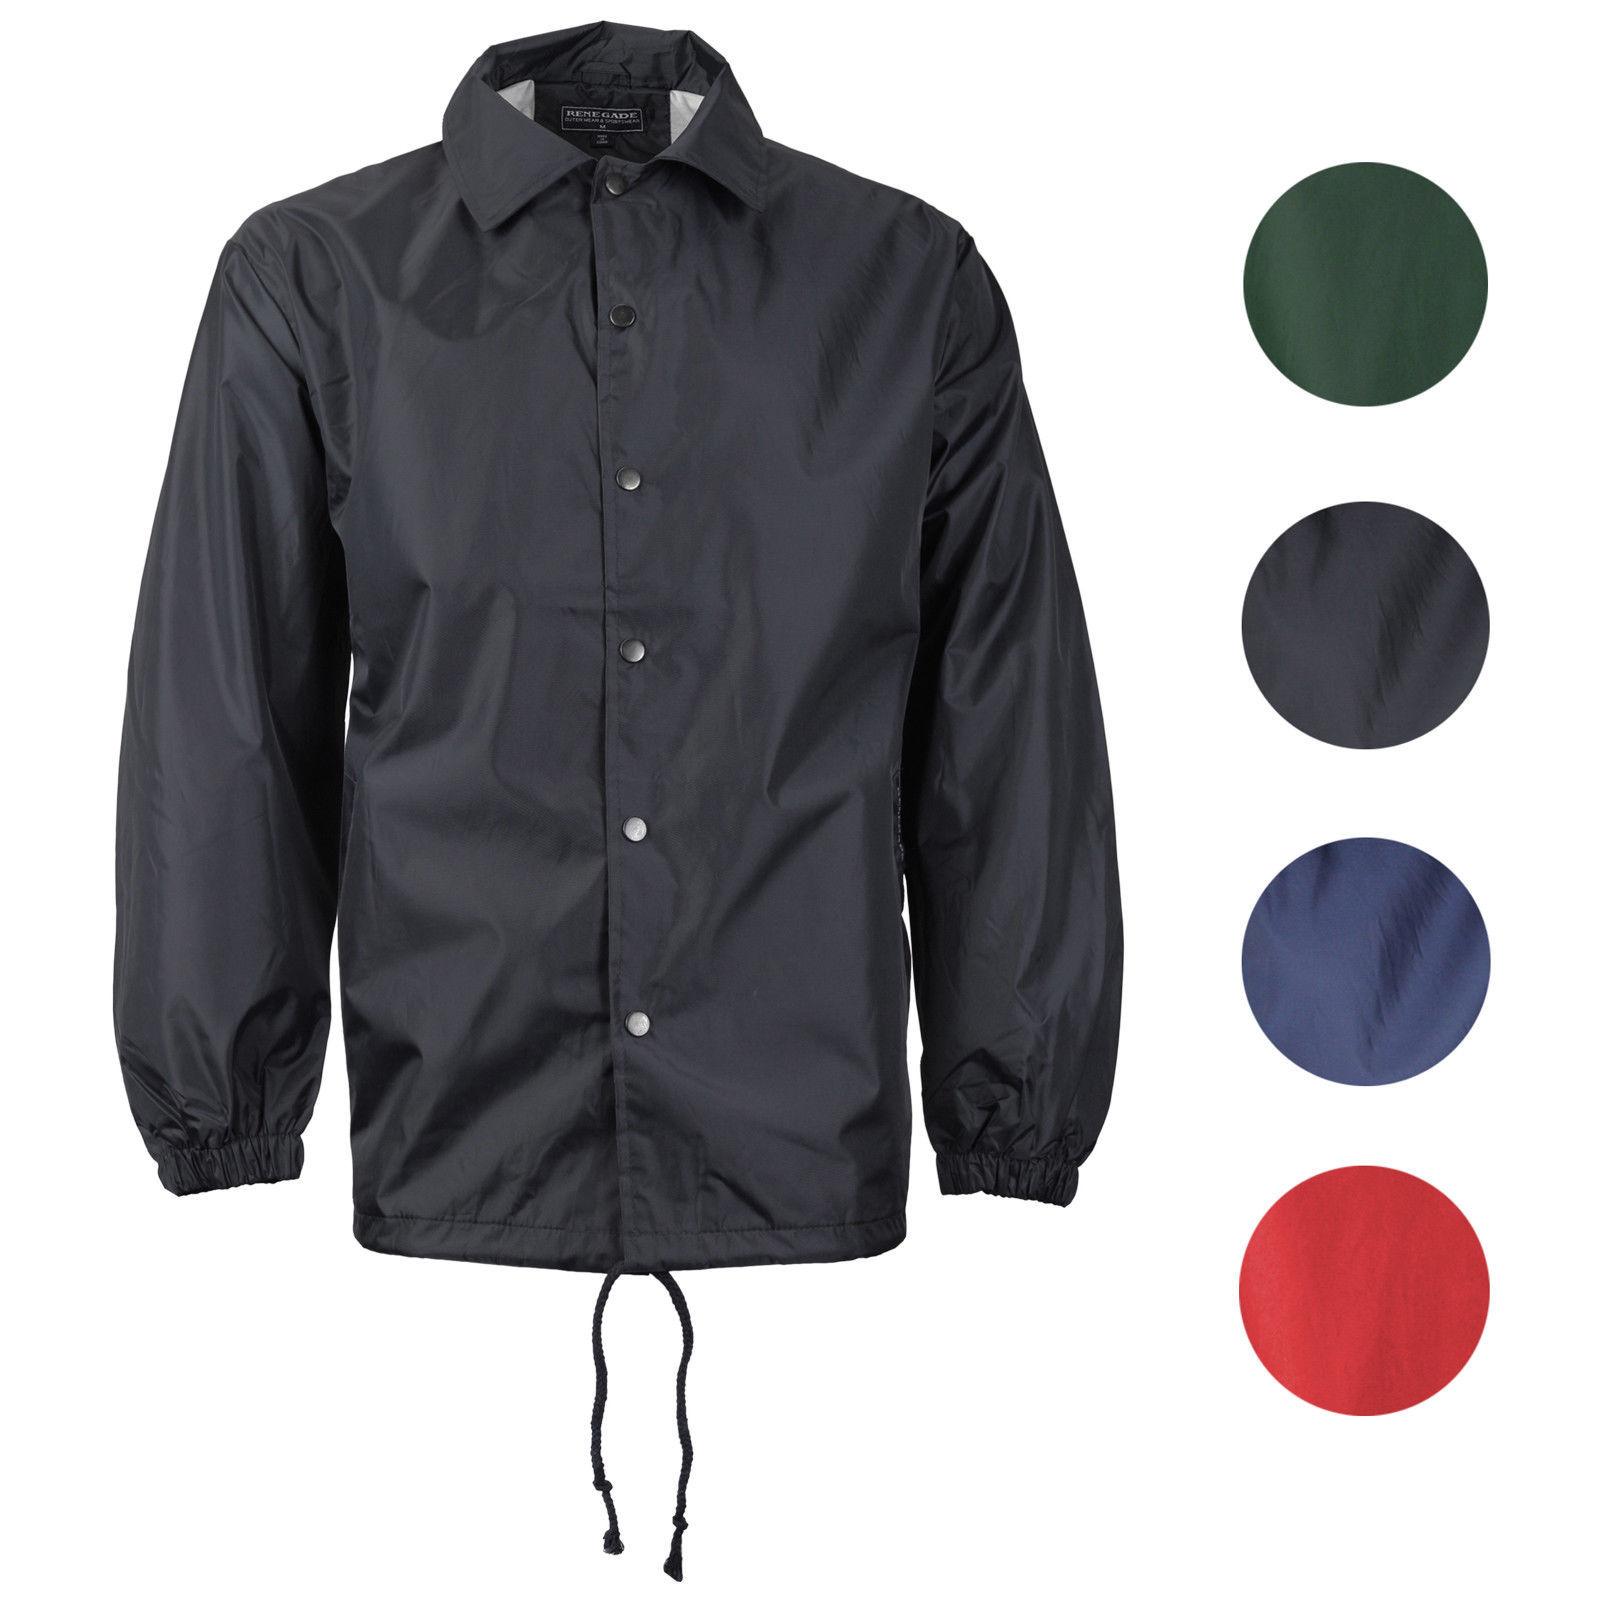 Renegade Men's Lightweight Water Resistant Button Up Windbreaker Coach Jacket